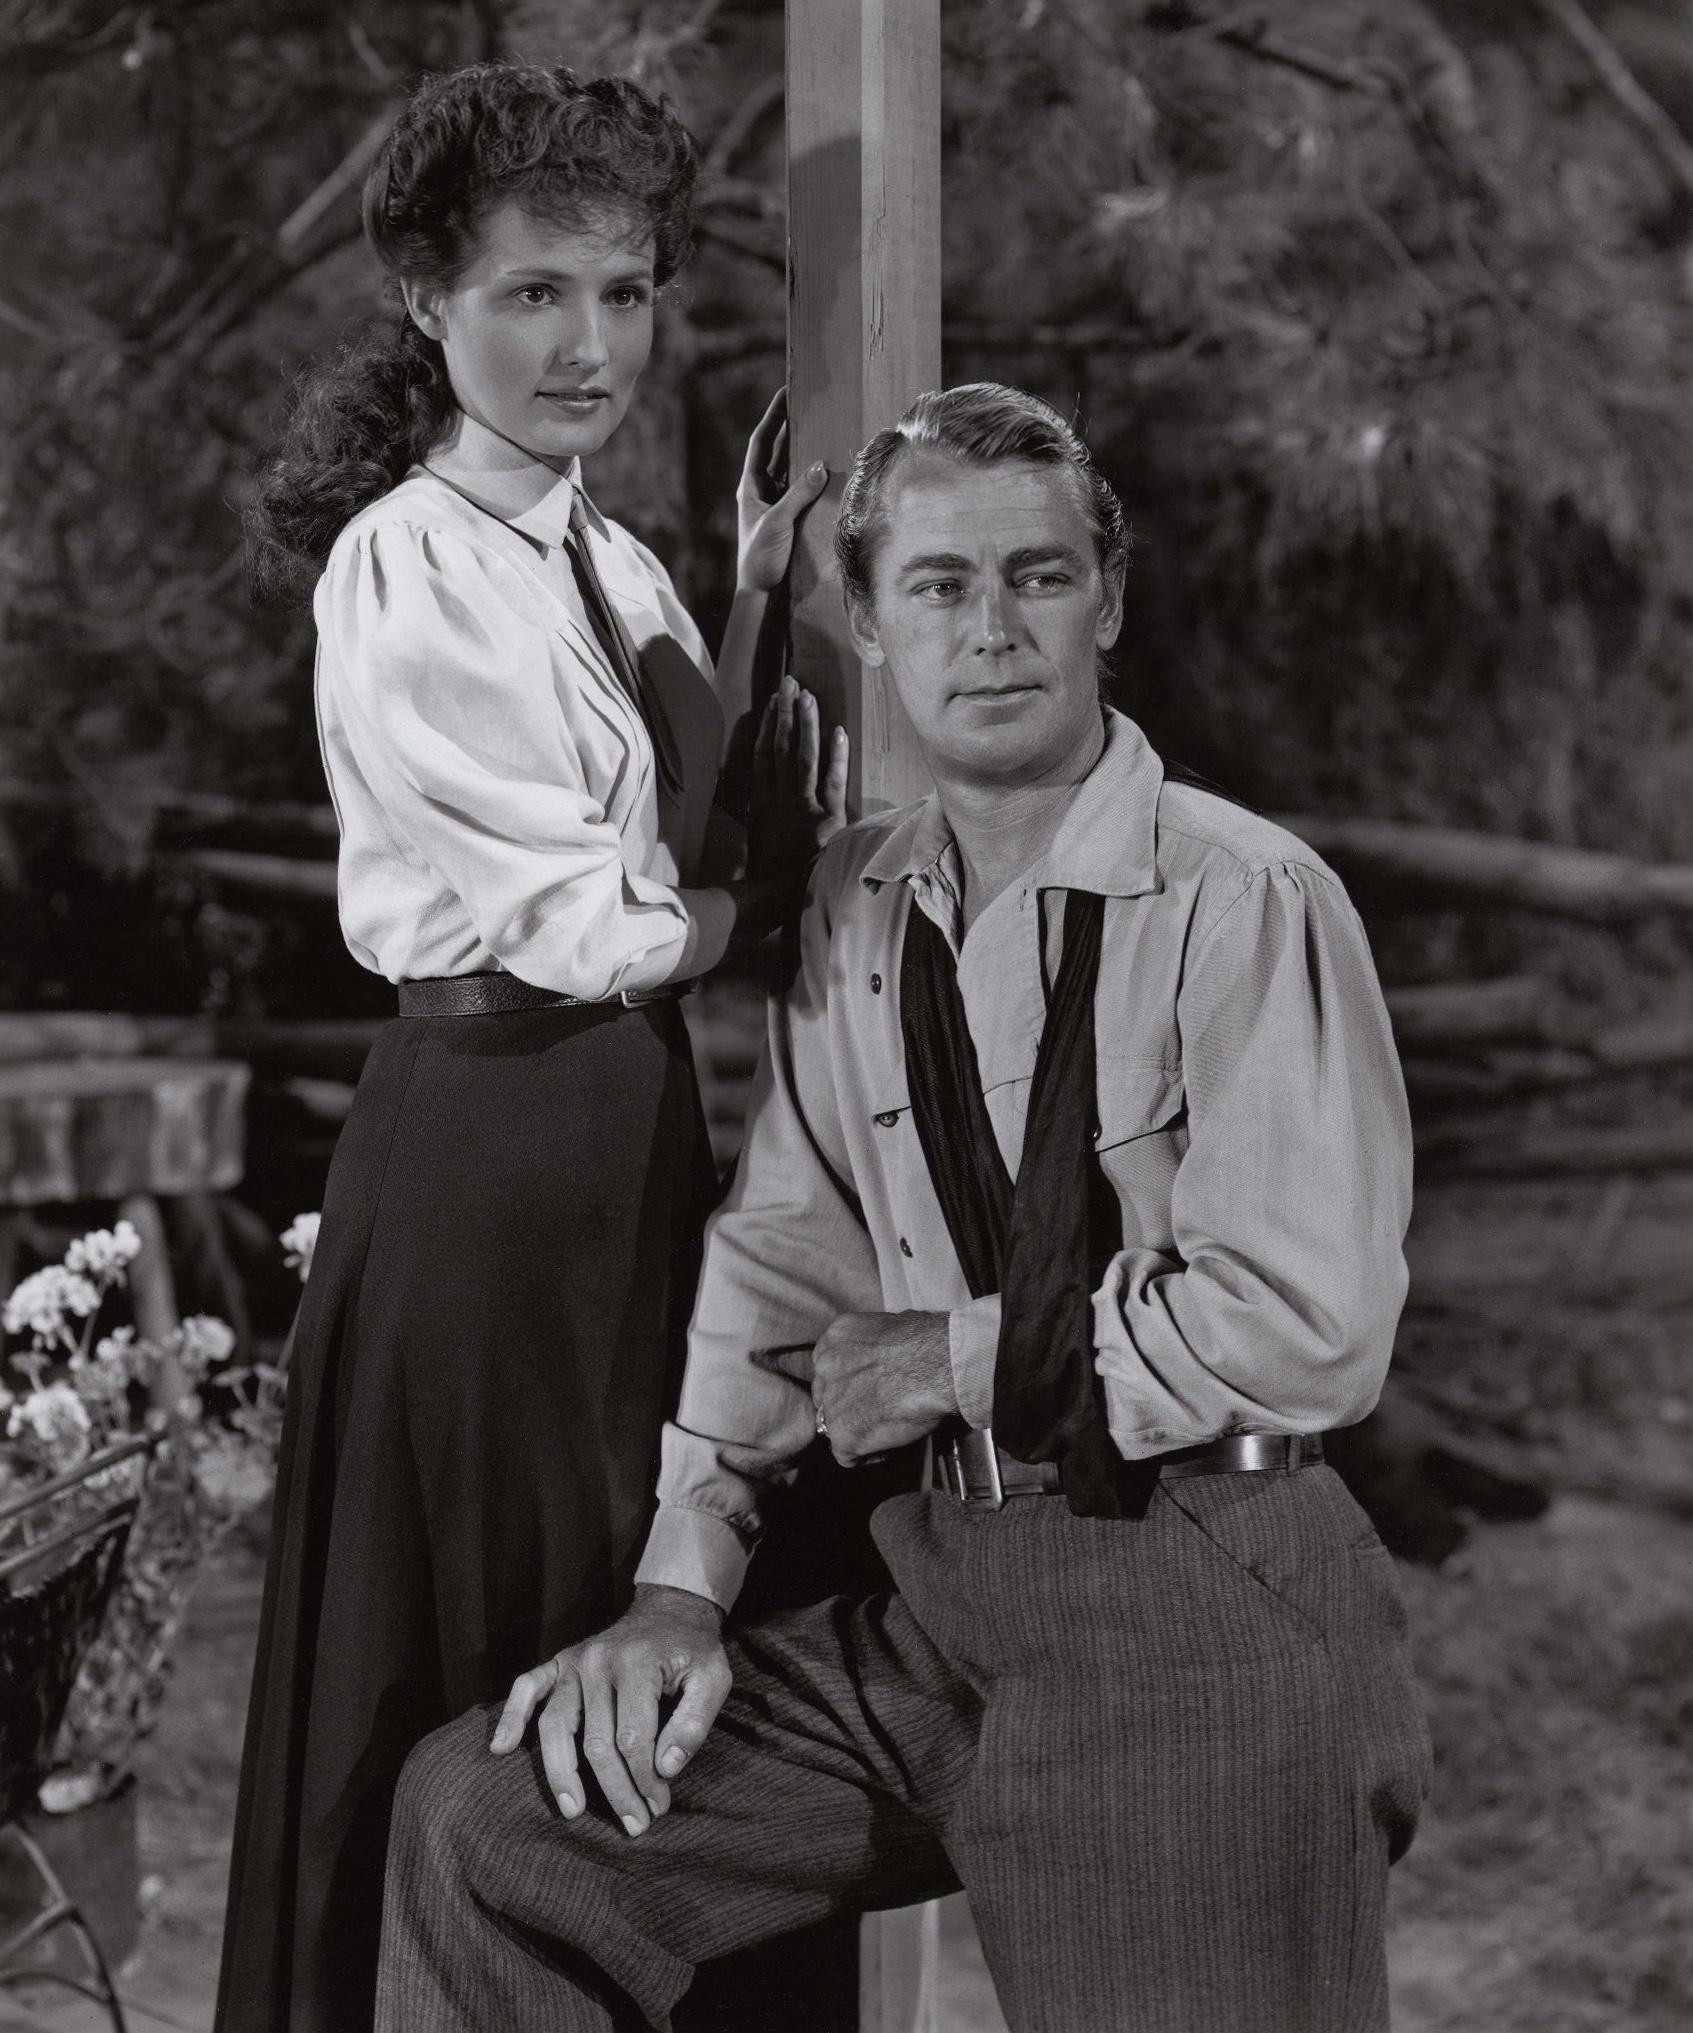 robert preston archives great western movies